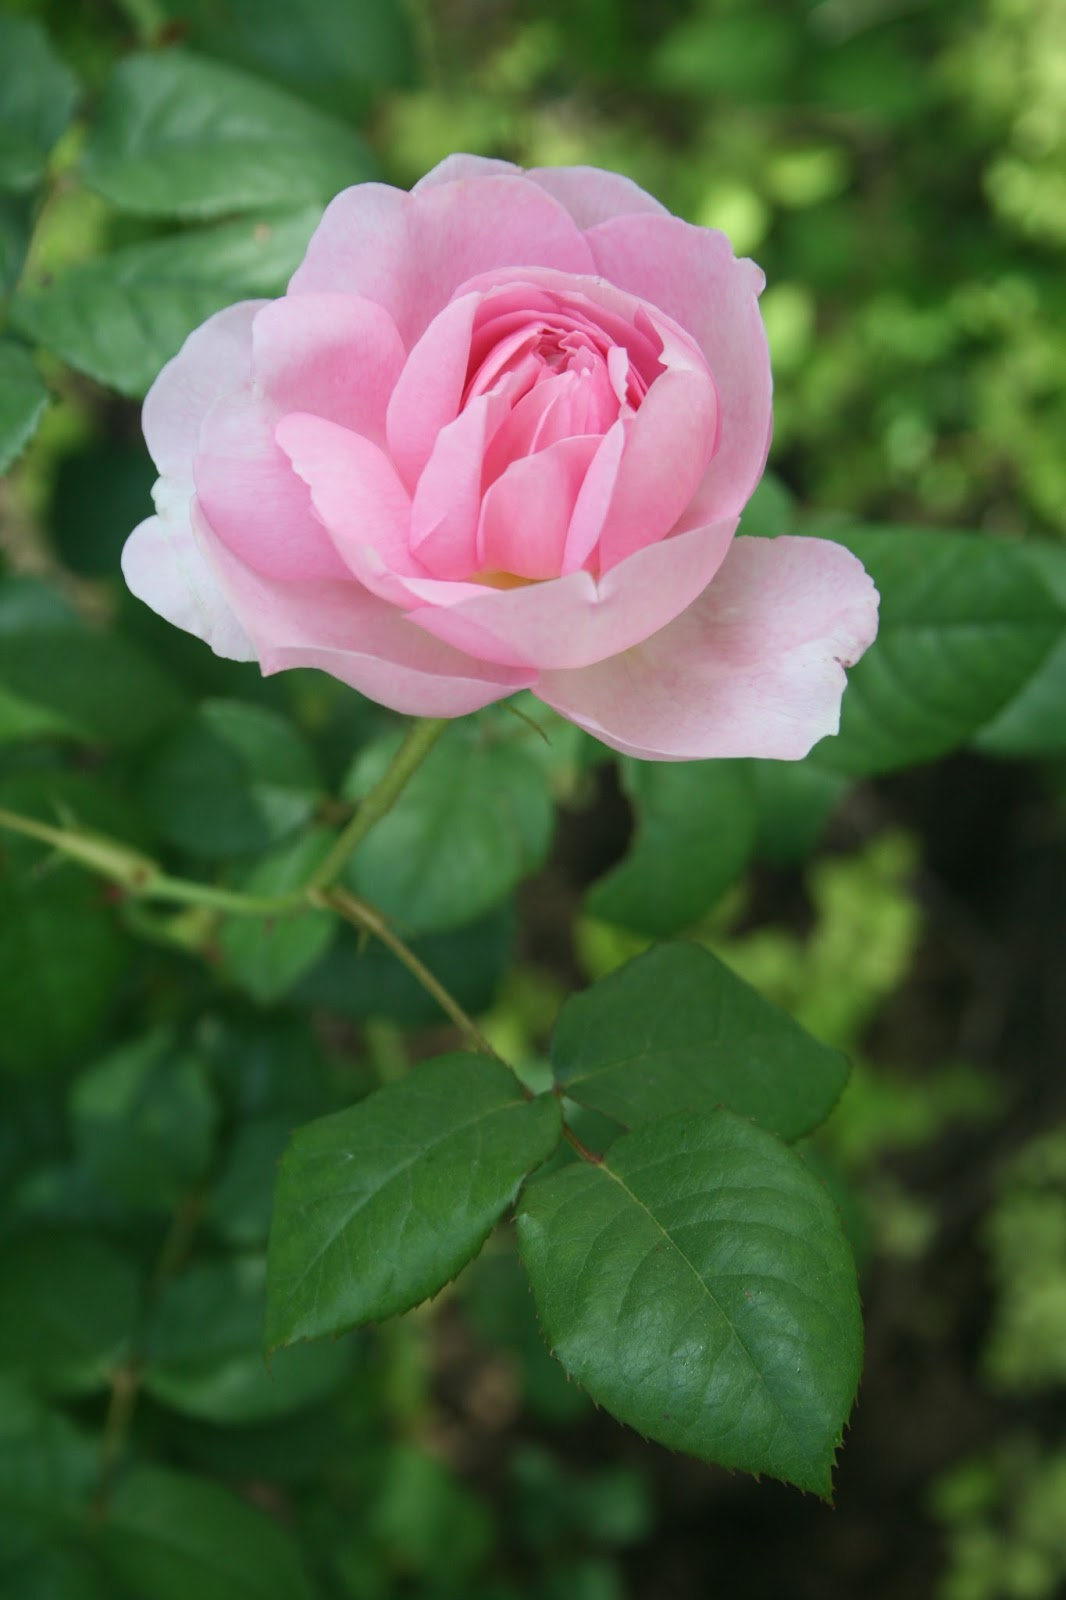 A Joyful Handmaiden Their Last Name Is Rose